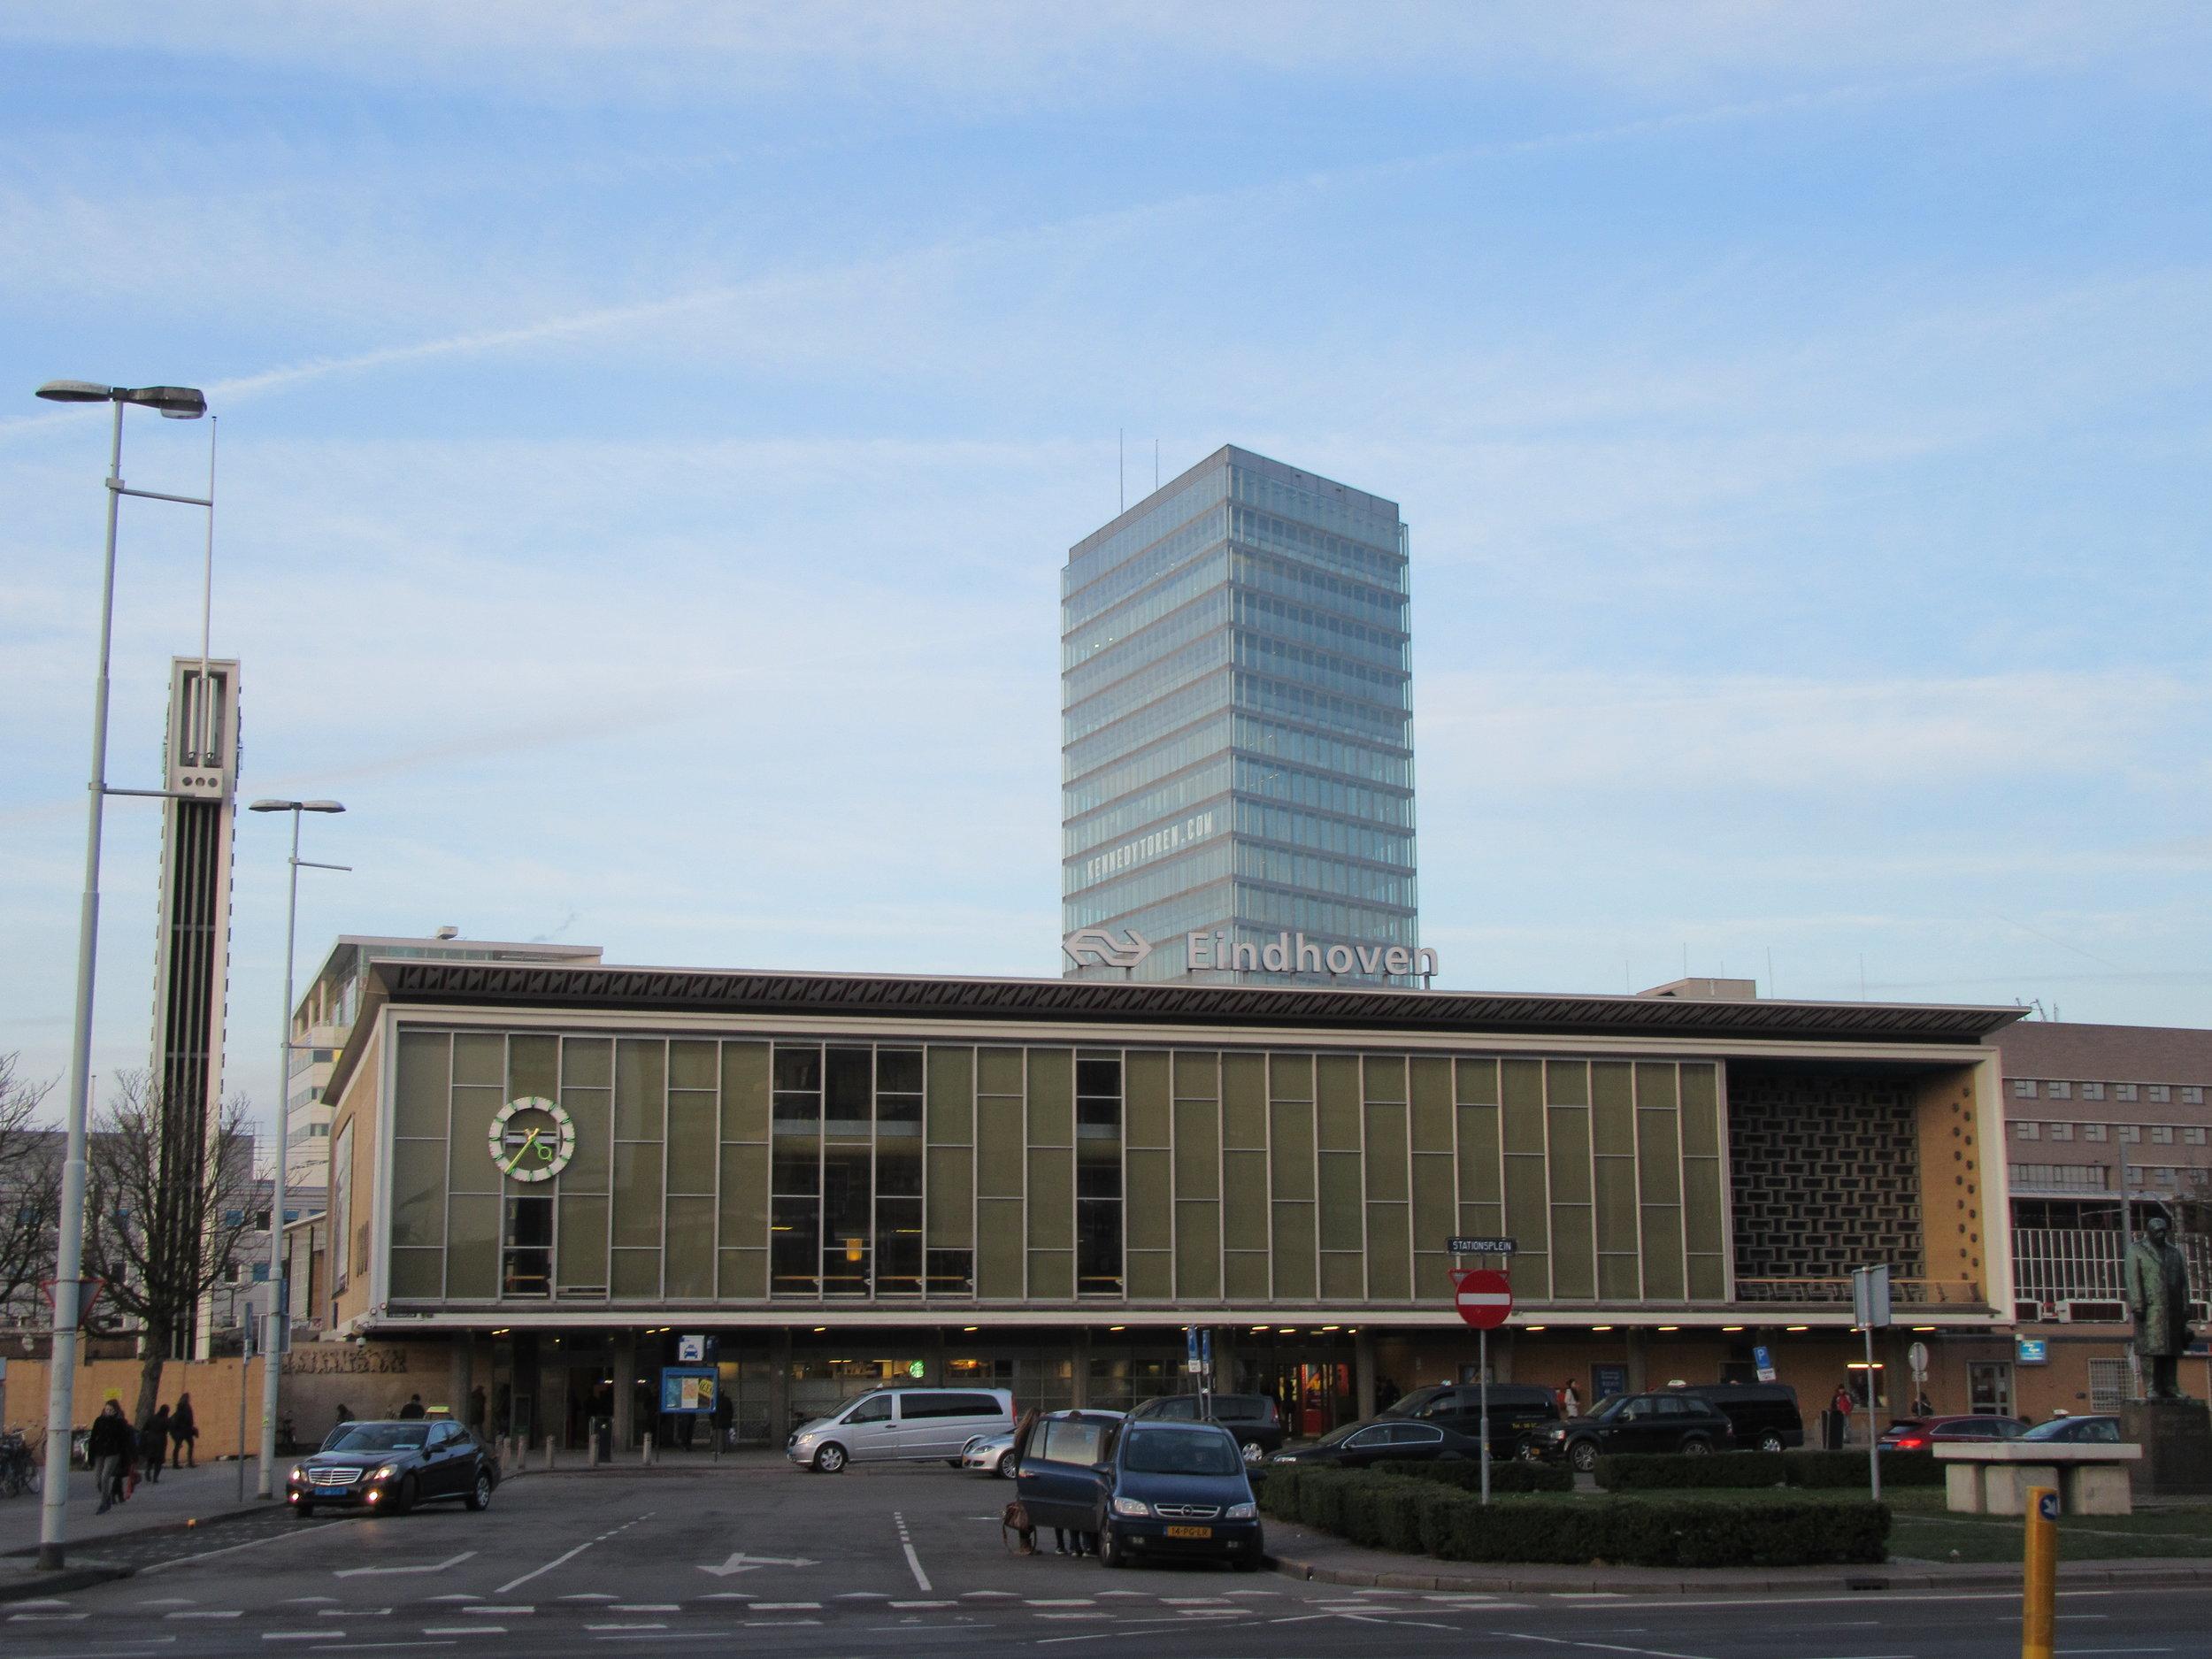 Eindhoven bus station.